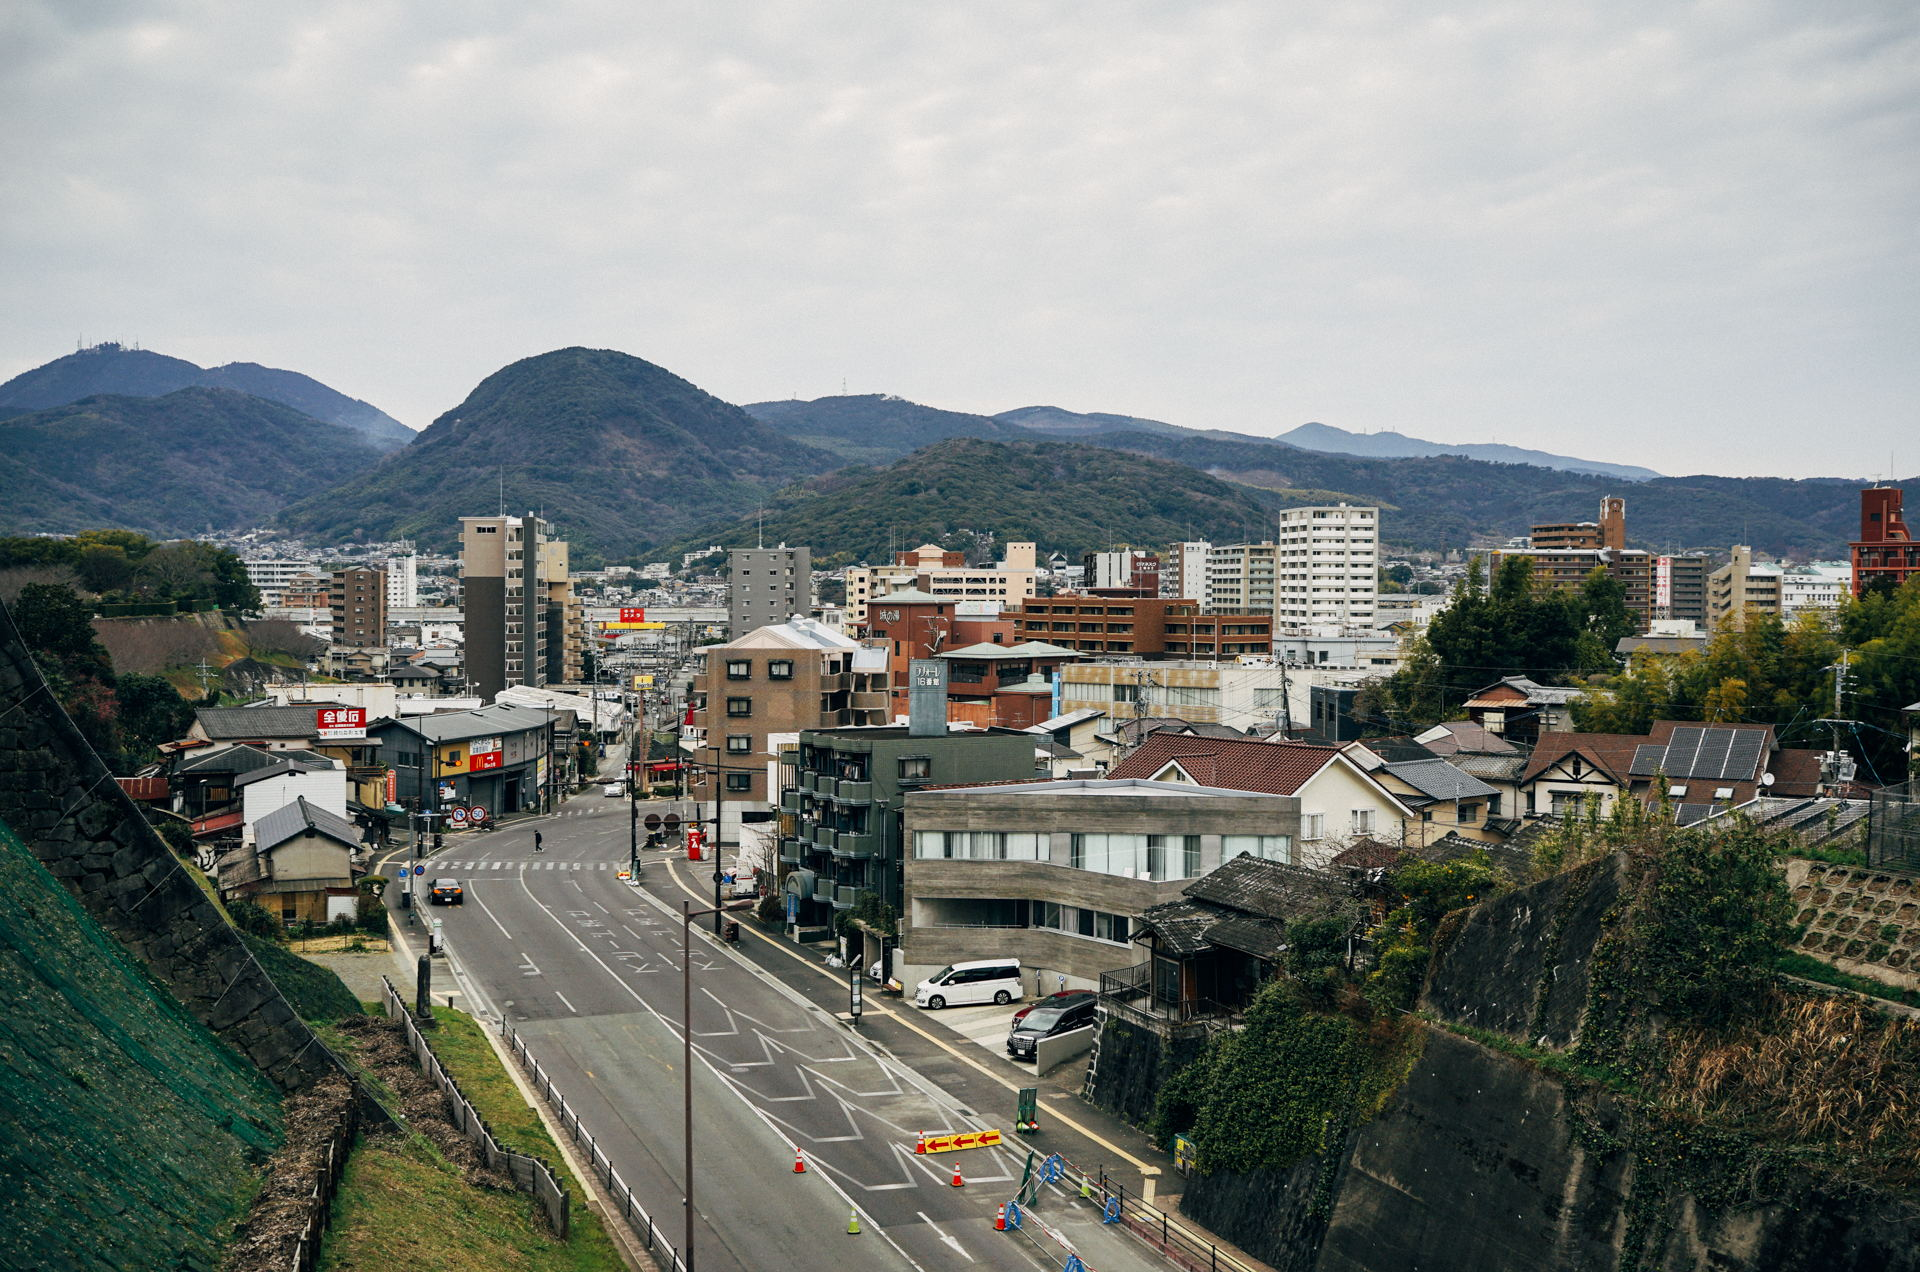 Kumamoto 3 years after